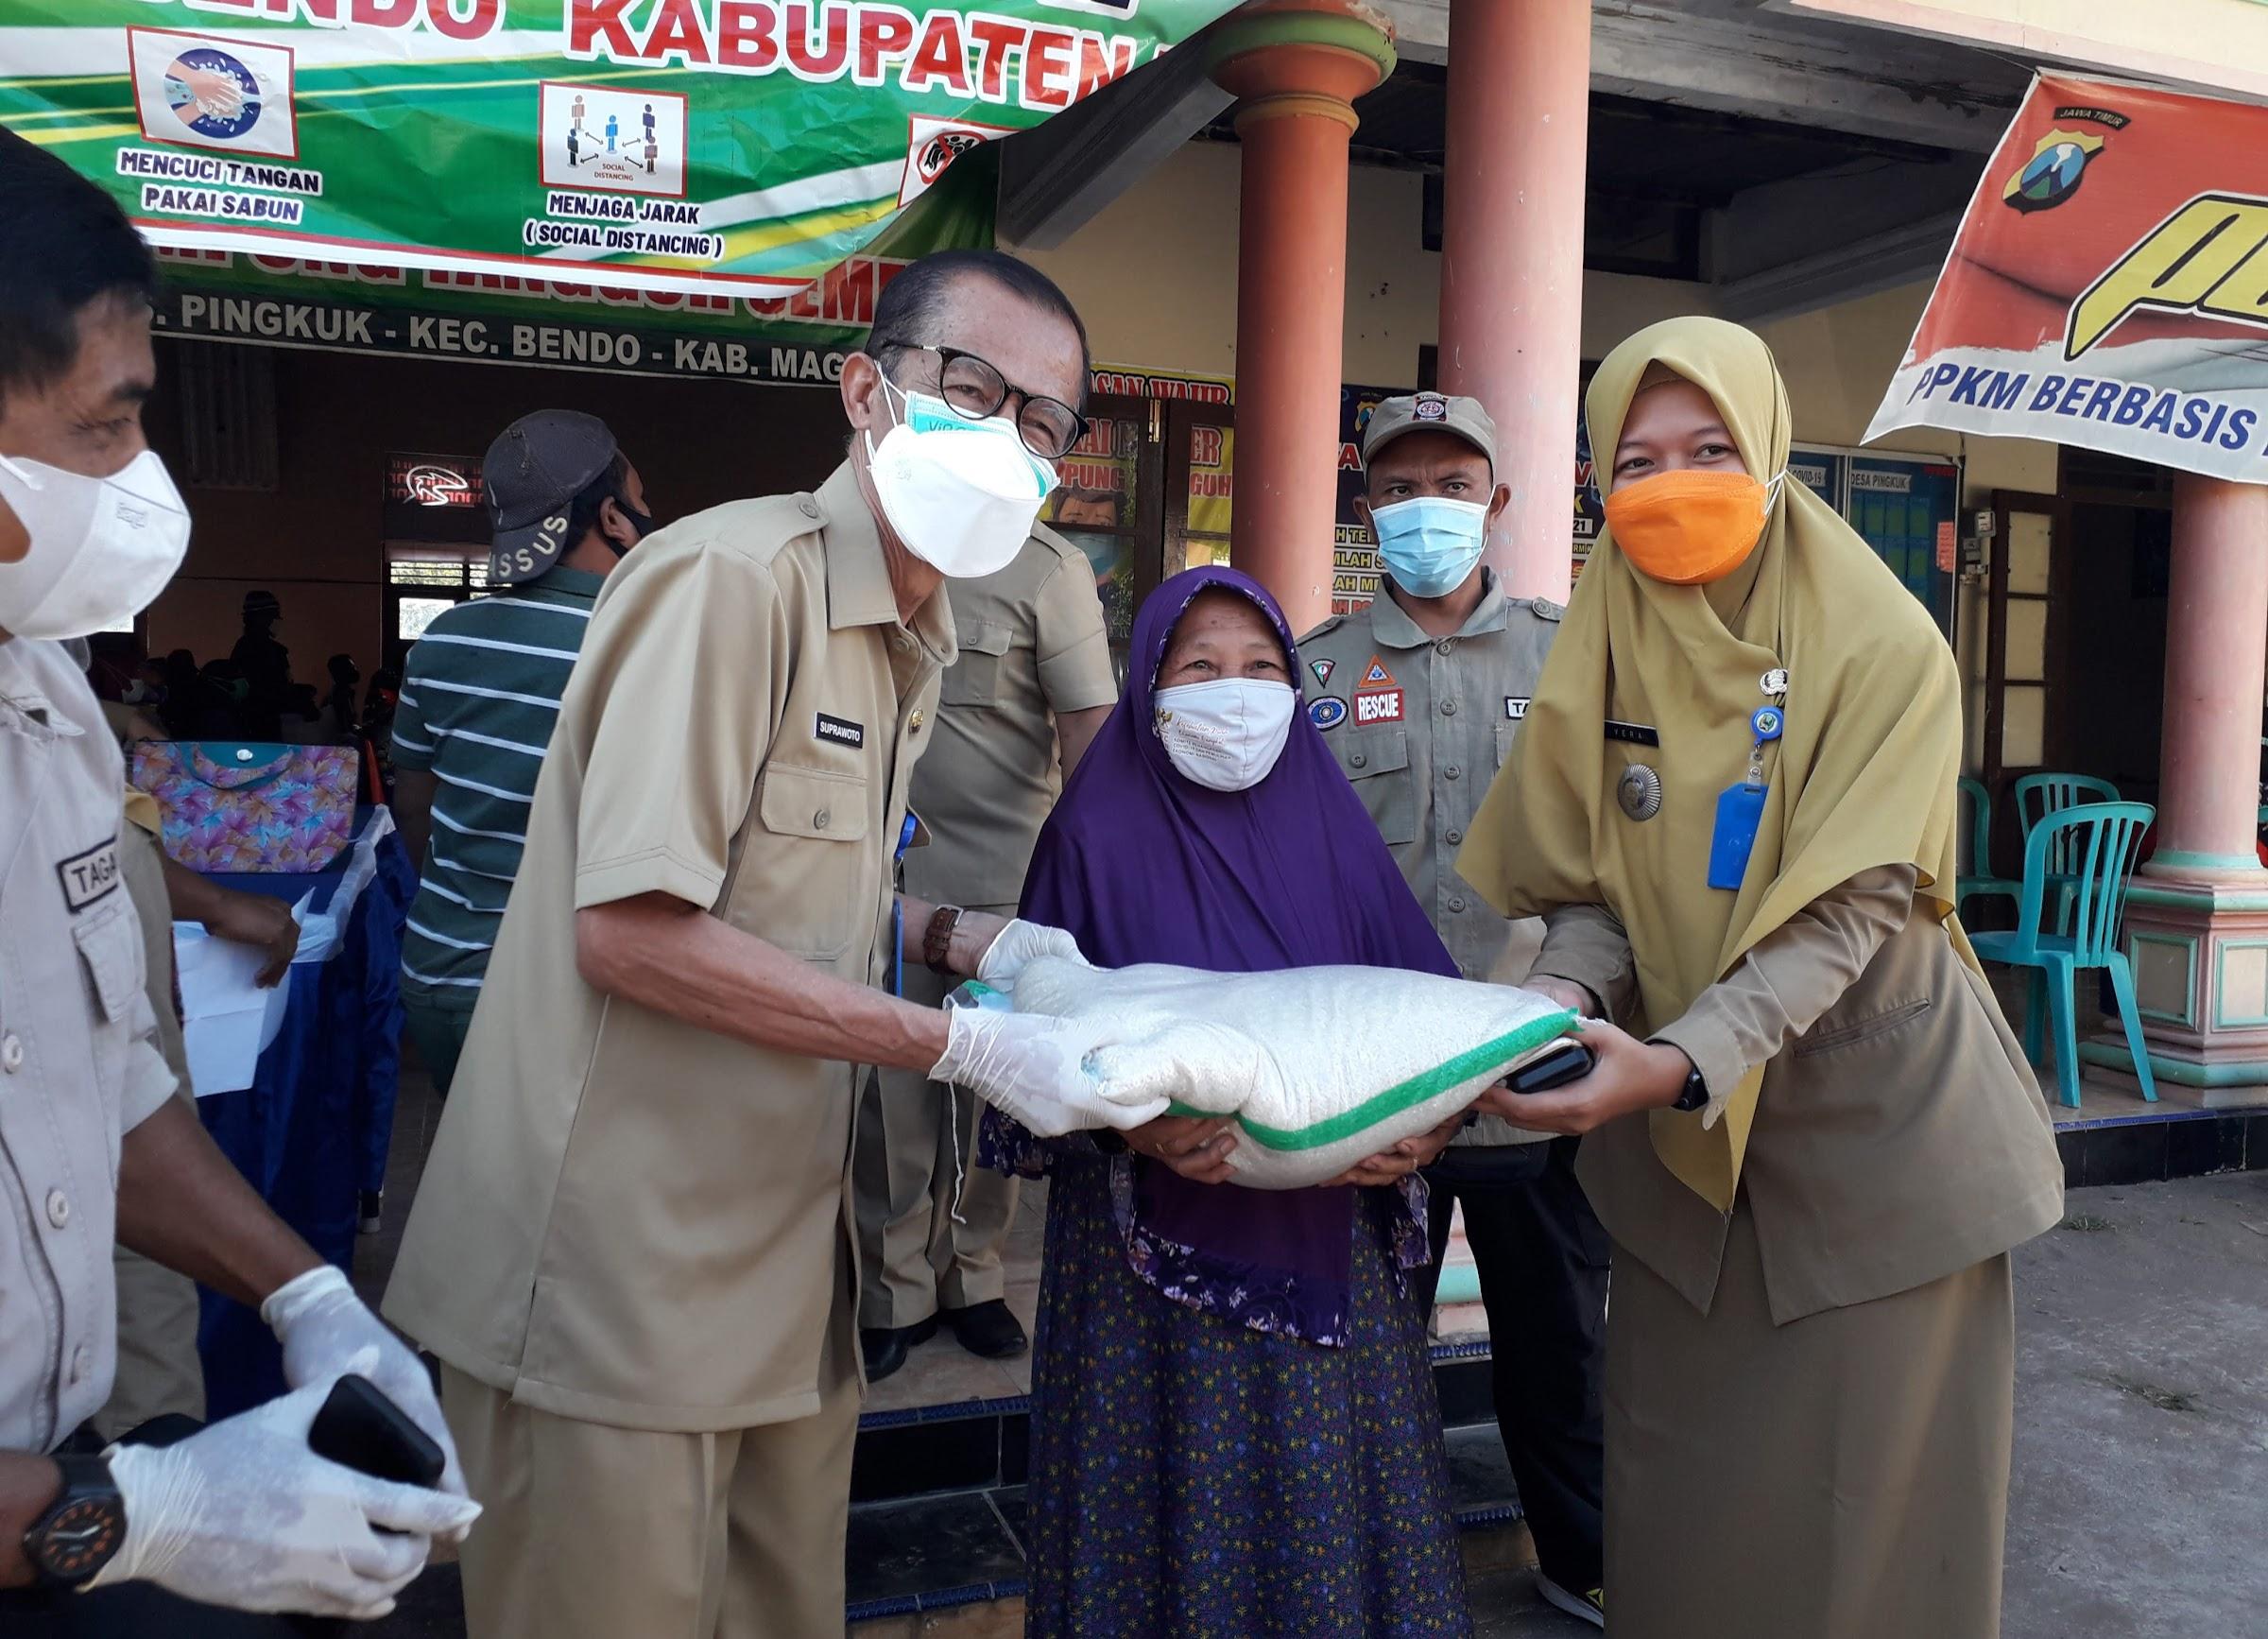 Bupati Magetan Tinjau Penyerahan BST DI Desa Pingkuk